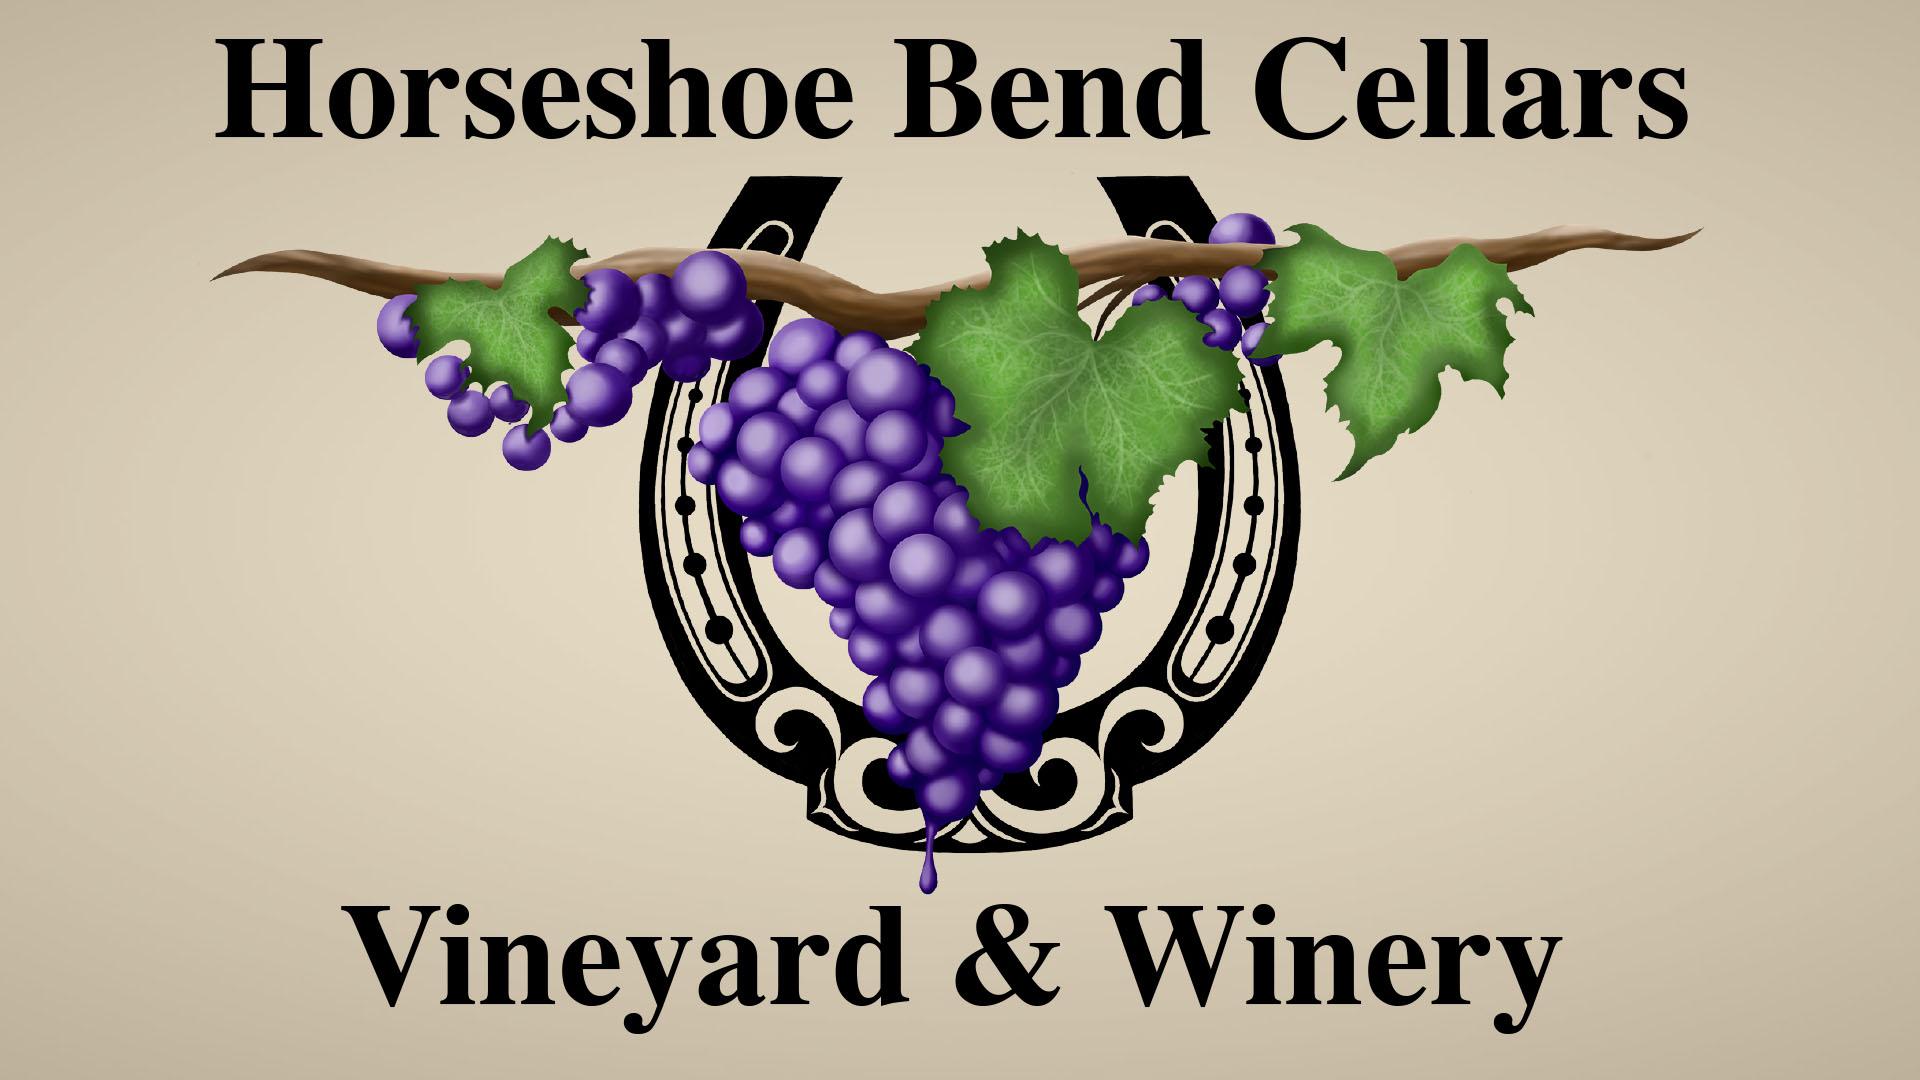 Horseshoe Bend Cellars Vineyard & Winery